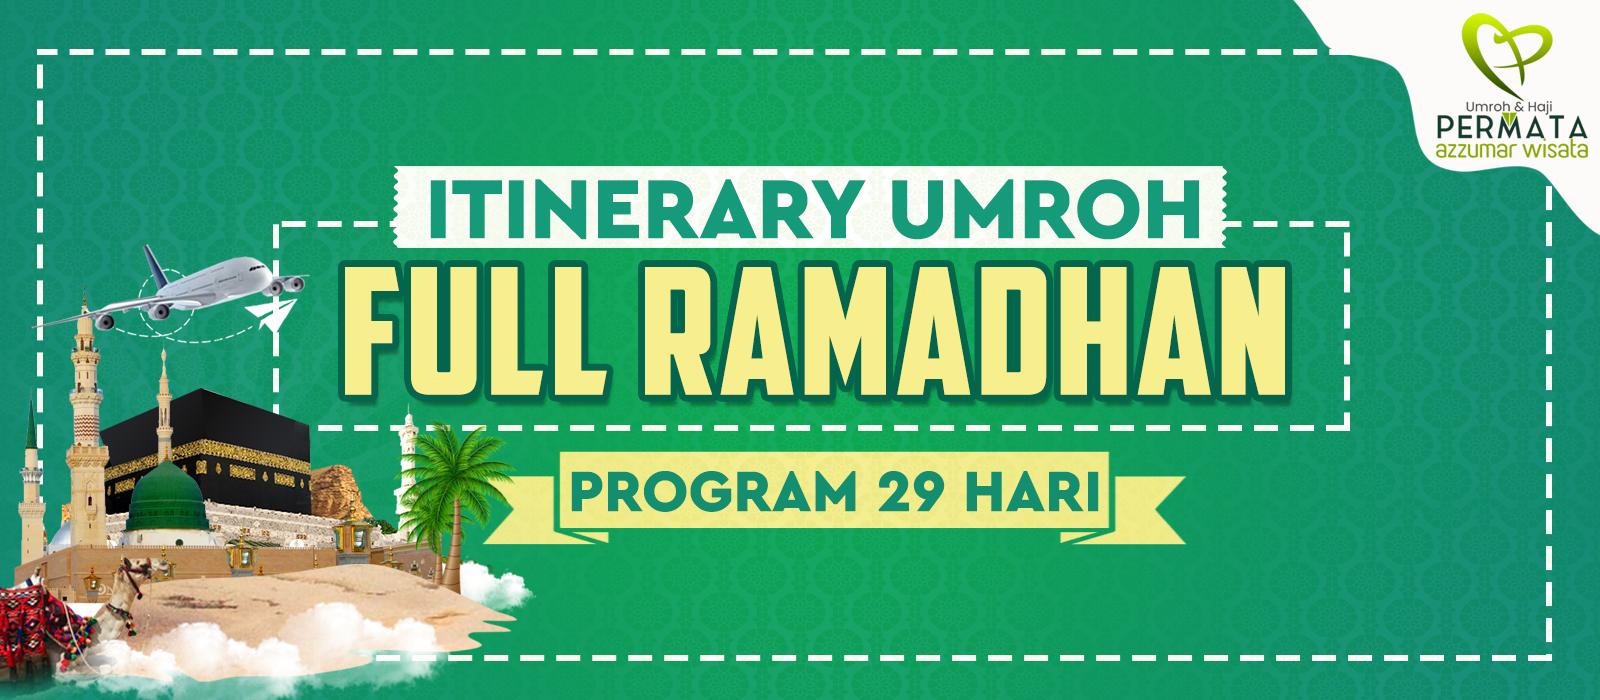 program umroh full ramadhan 29 hari 2020